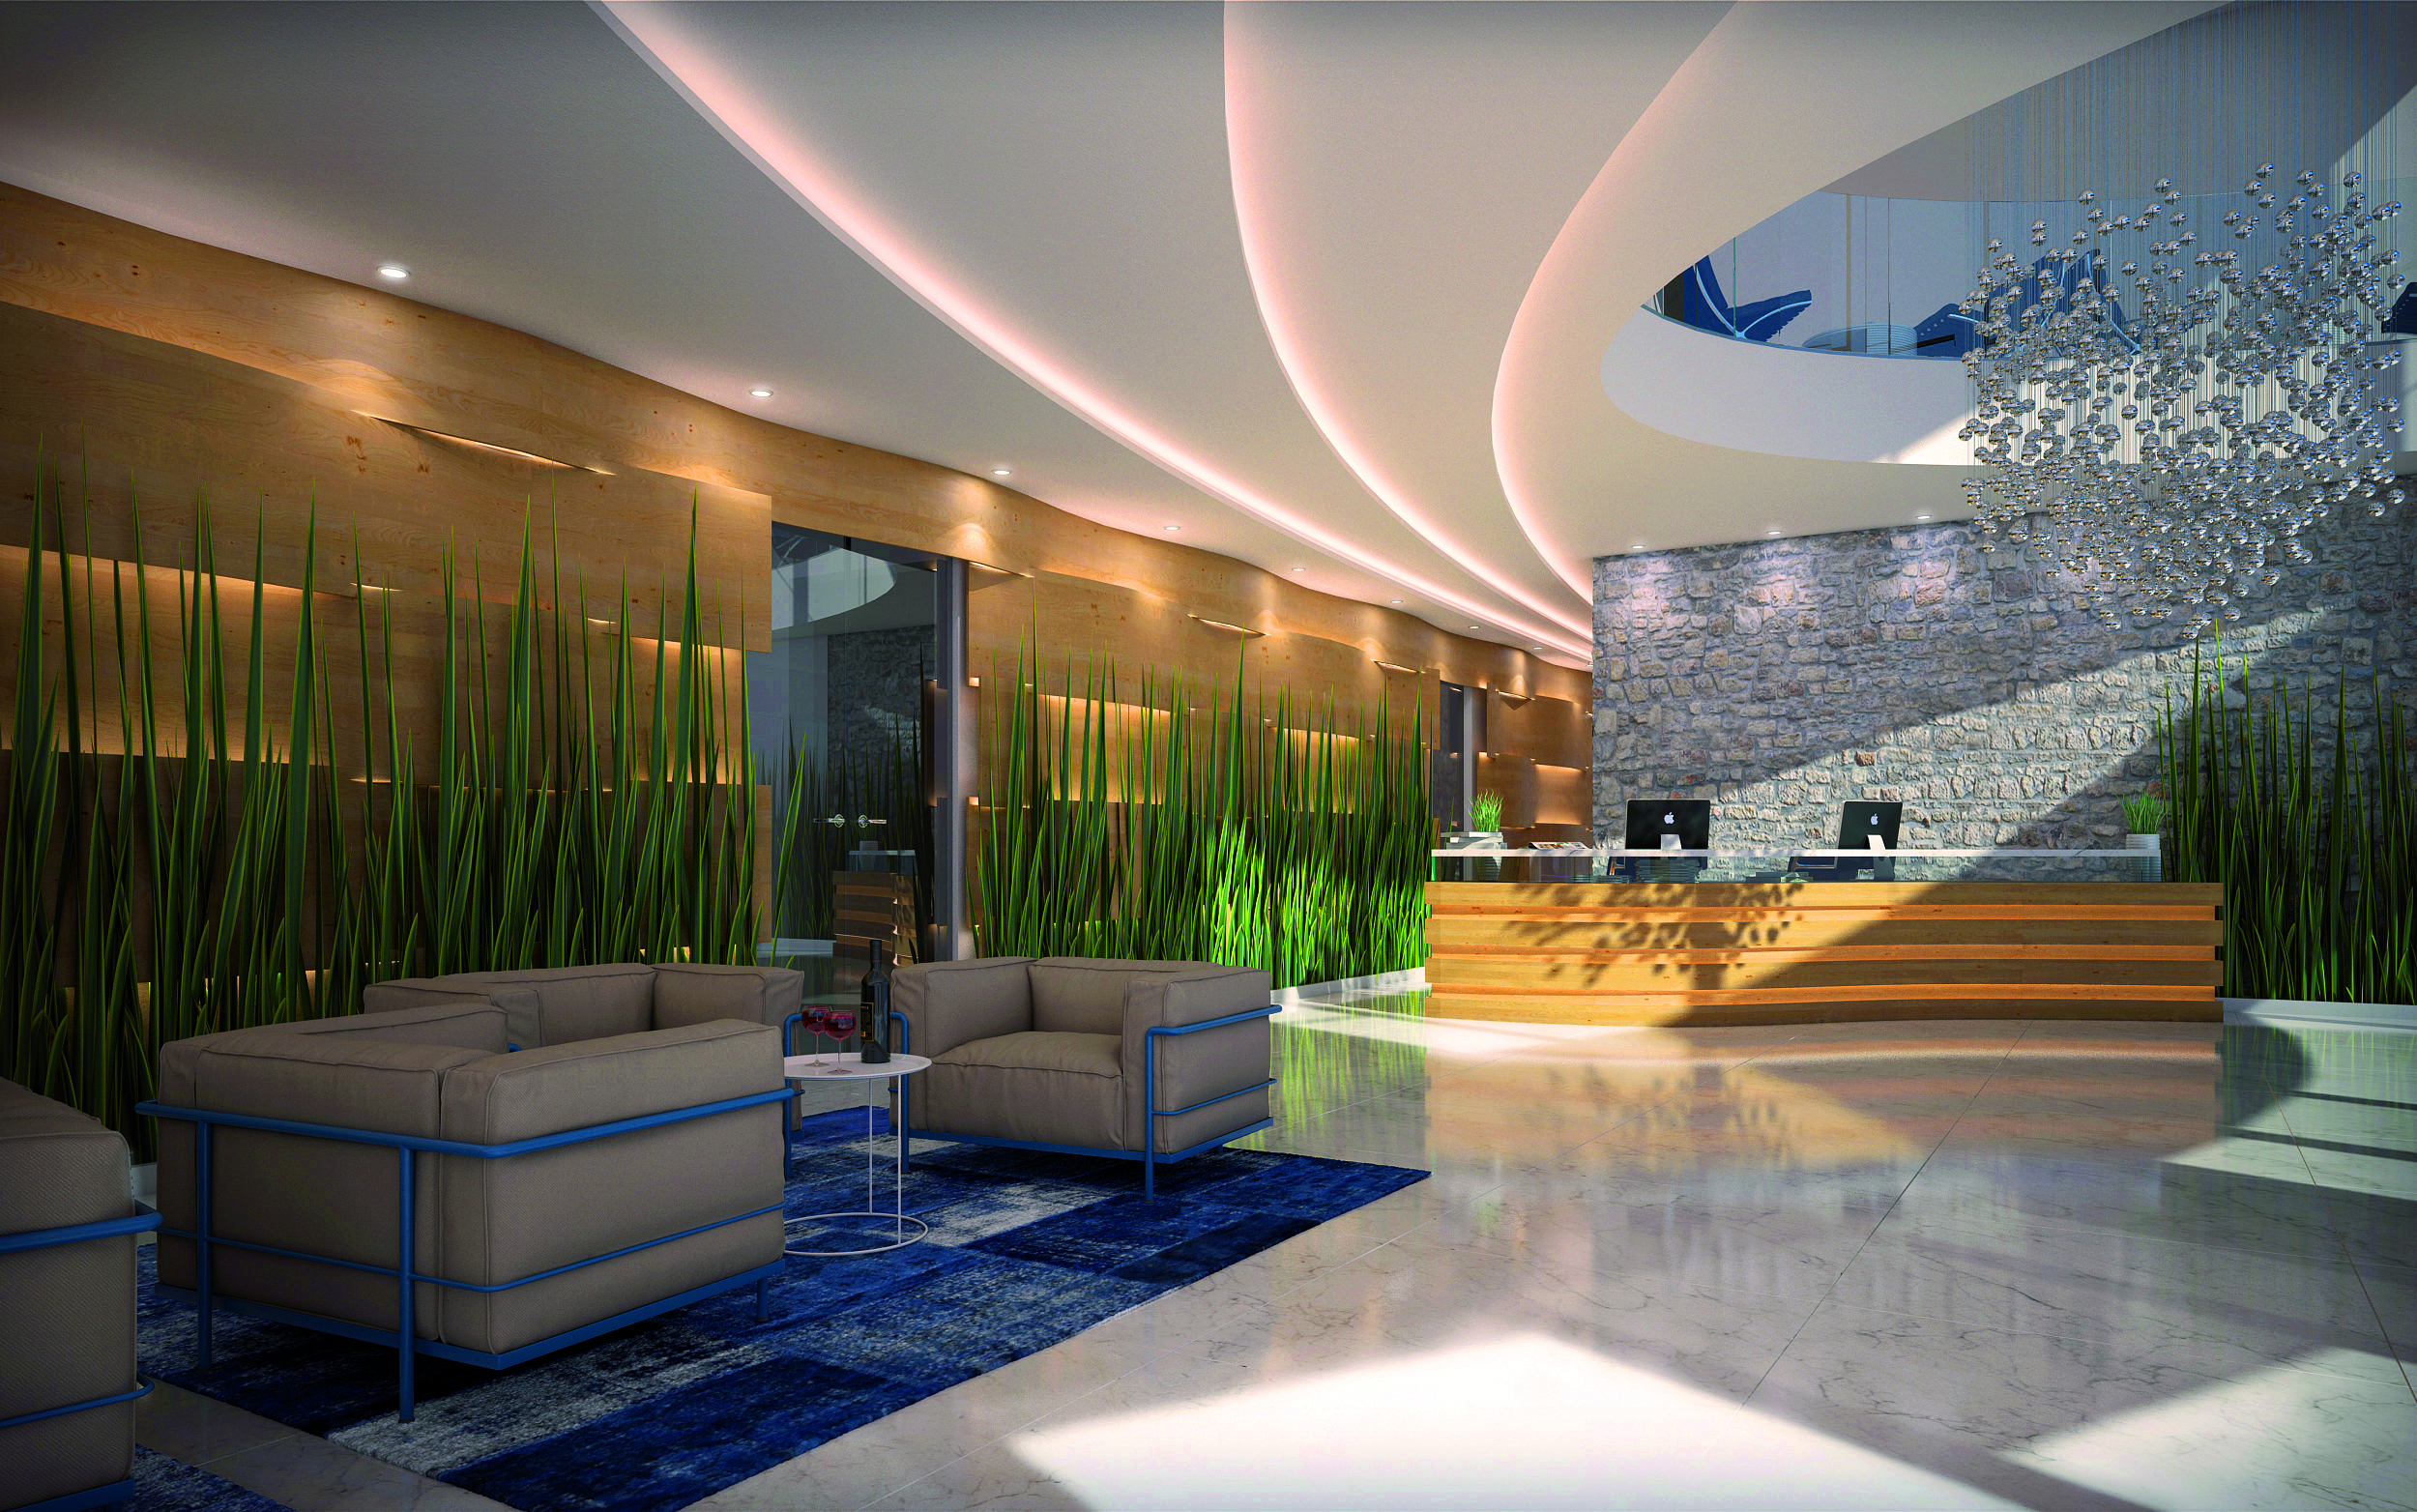 Westagte_hotel loby_2_0001 g77